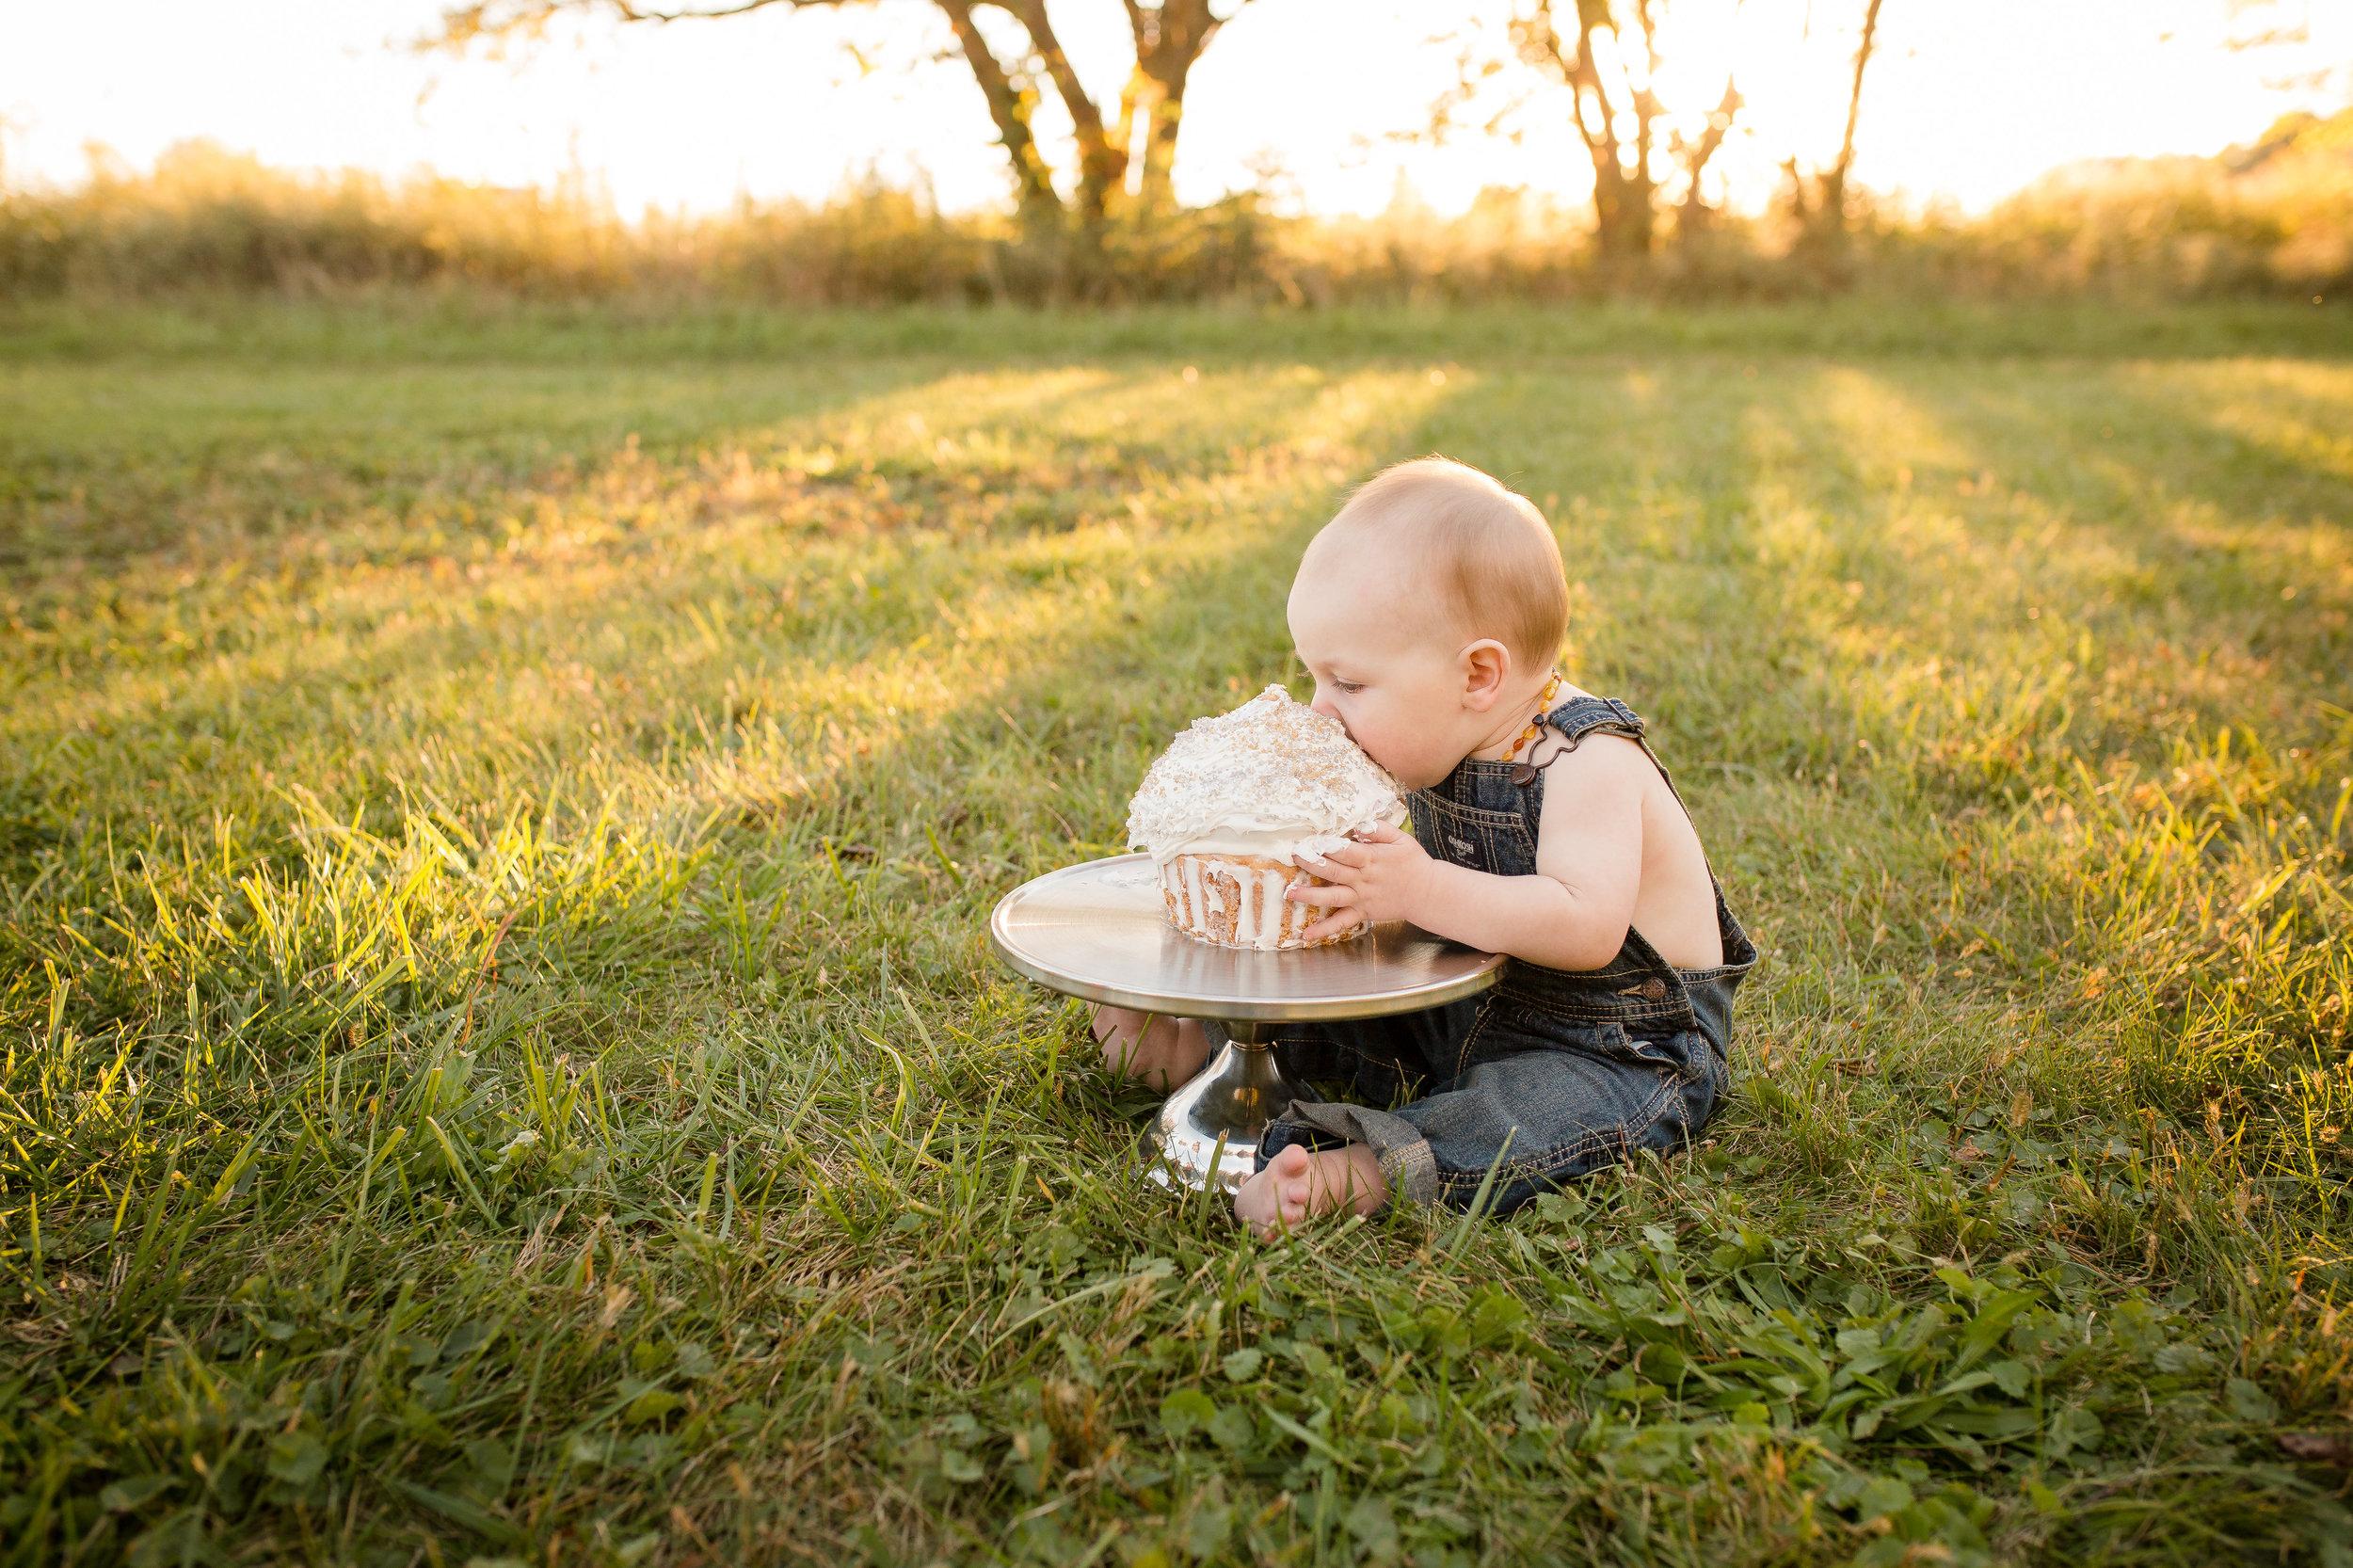 Columbus Baby Photographer | Sarah Cropper Photography | Grove City Ohio Photographer | Columbus cake smash